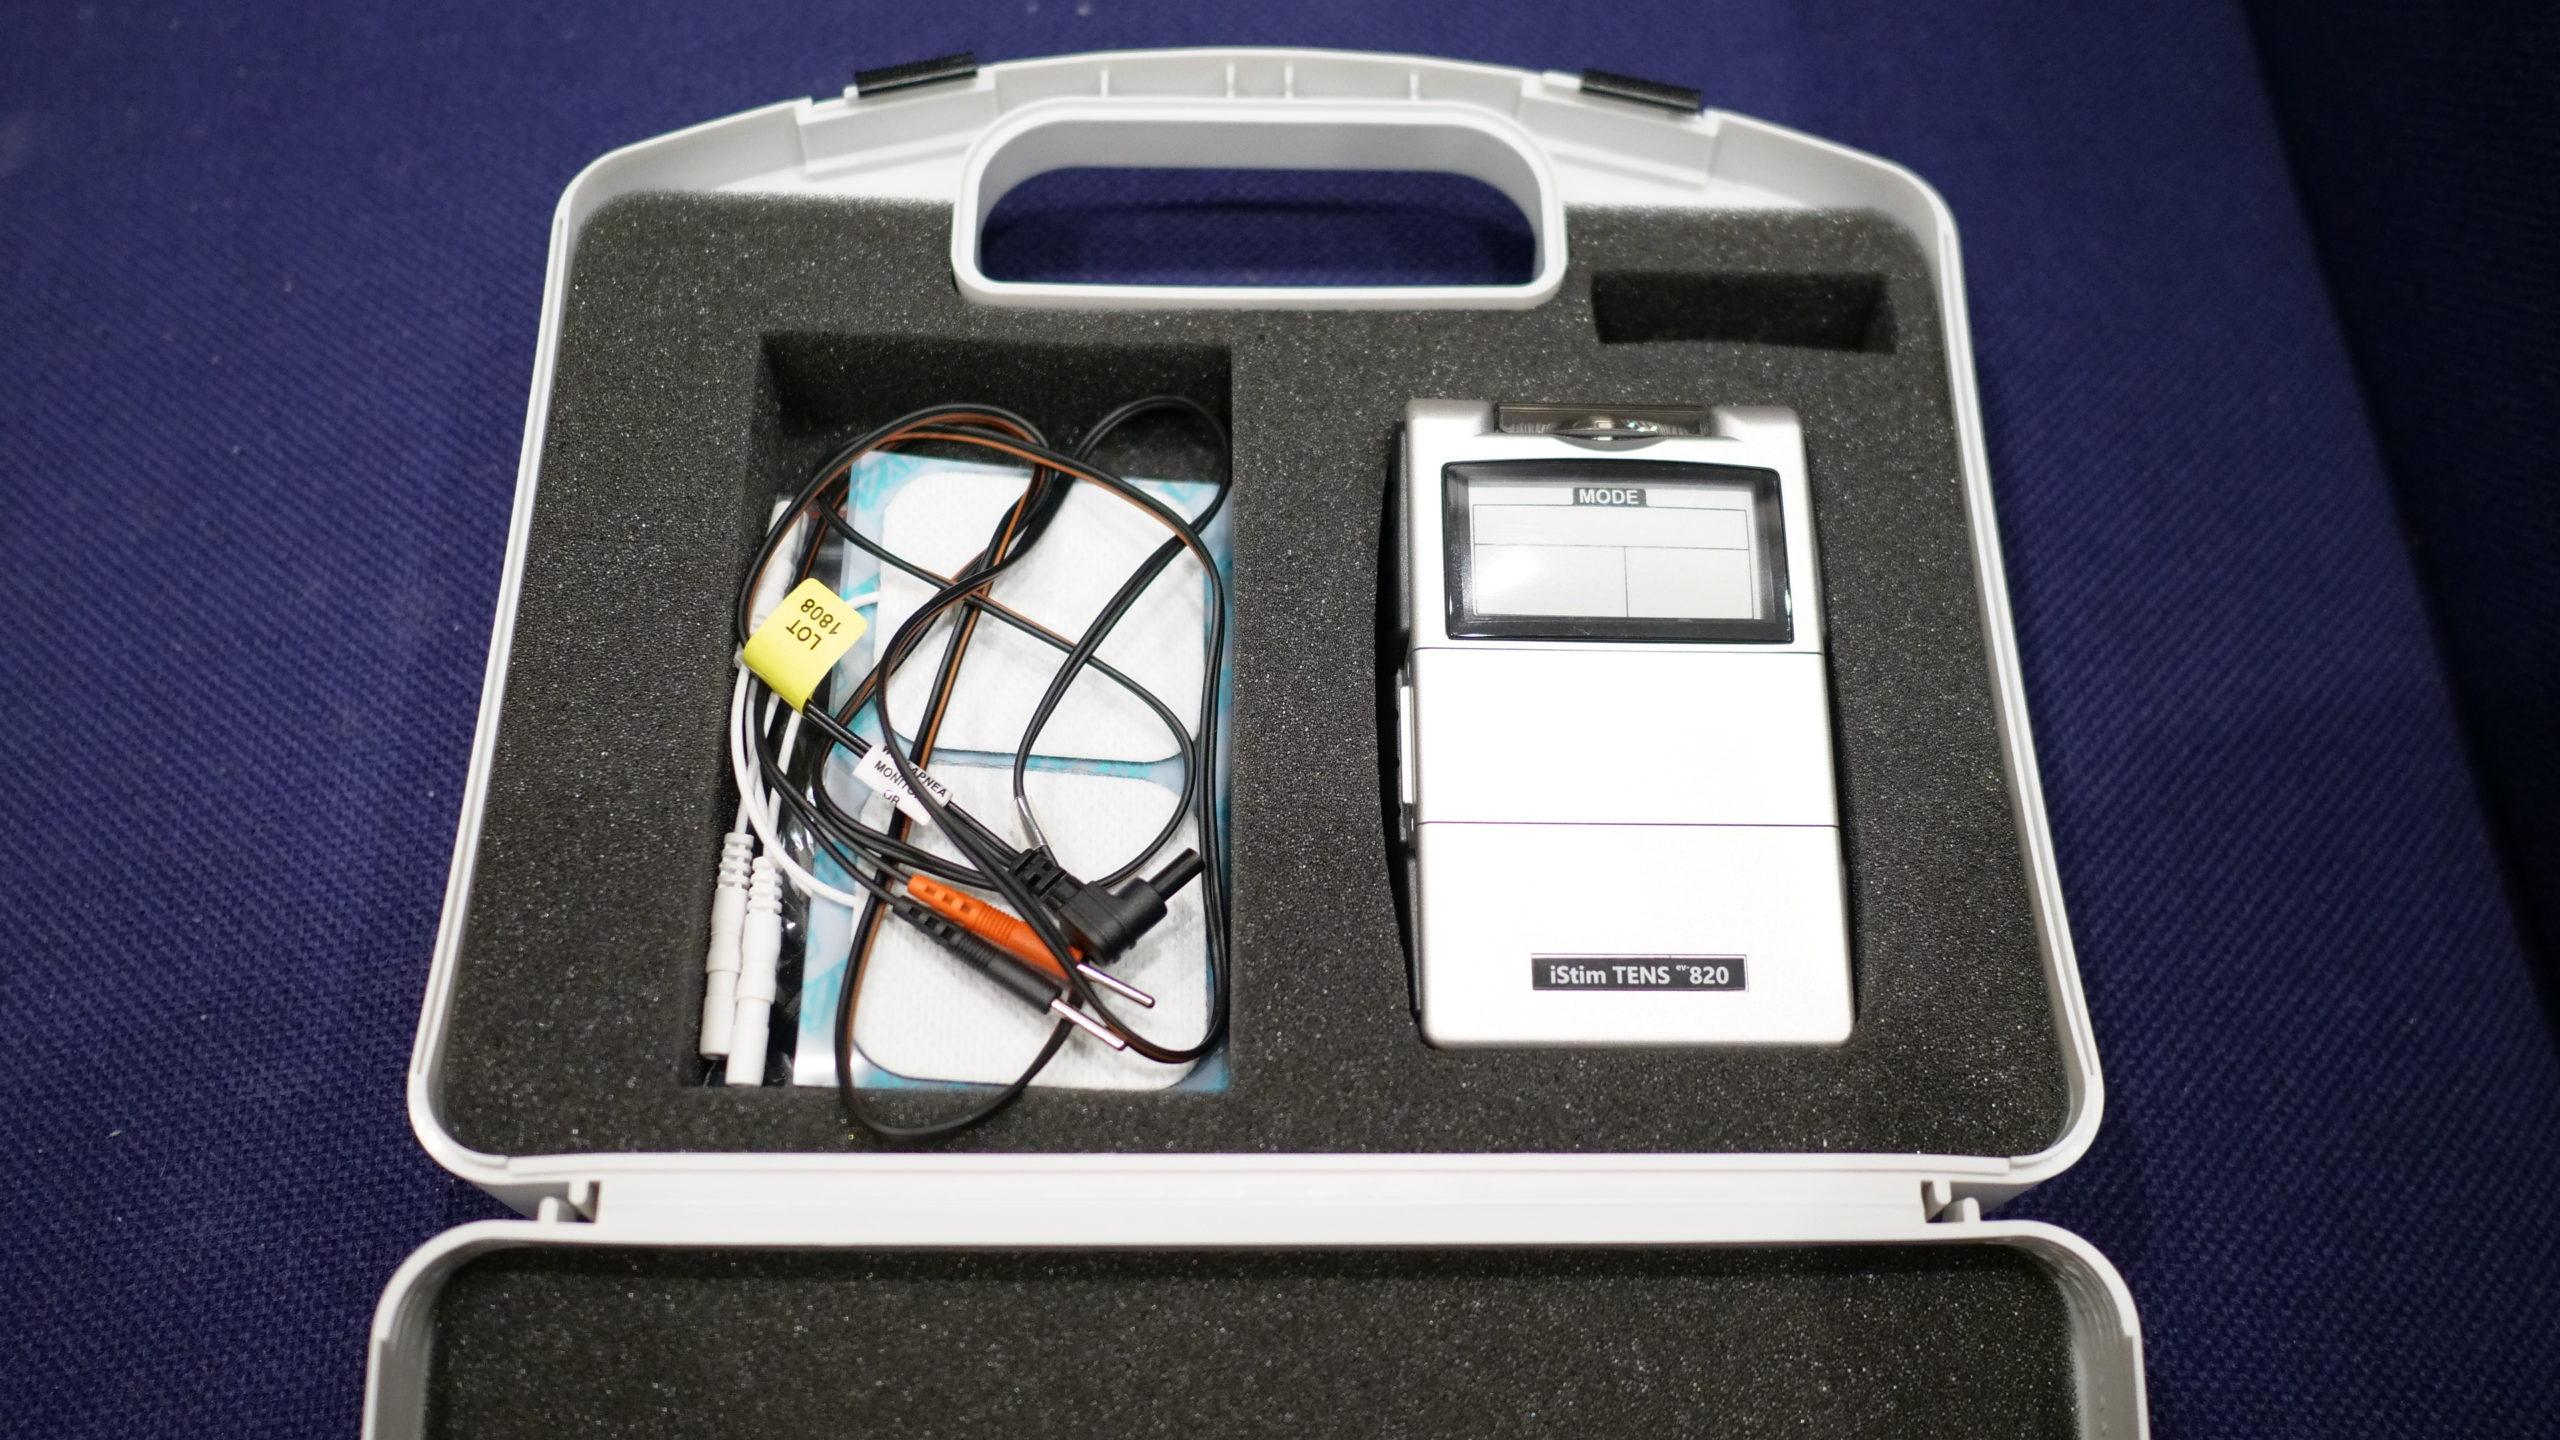 iStimの低周波マッサージ機「EV-820 TENS Massage Machine」